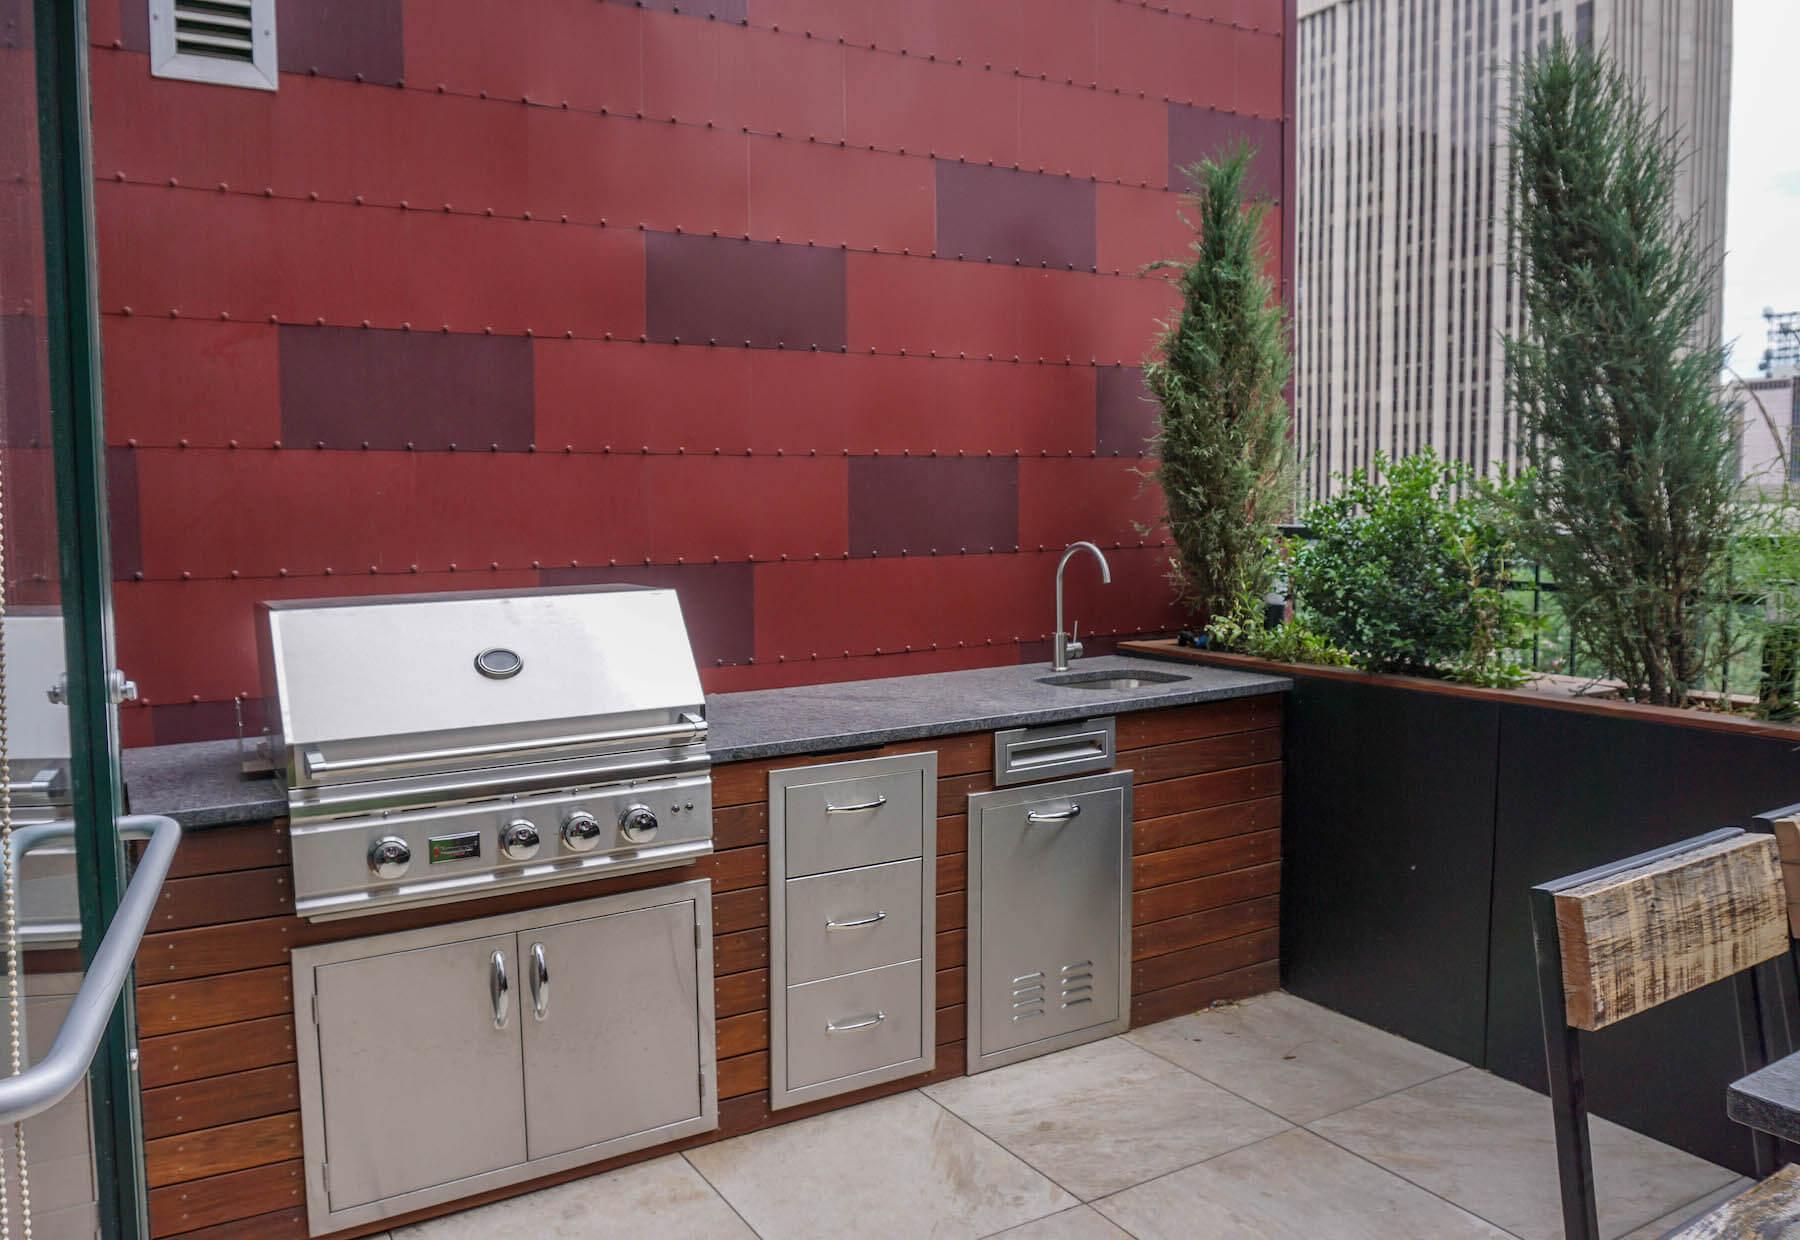 Built-In Furniture Rooftop Deck Outdoor Kitchen Built-In Planters Downtown Denver